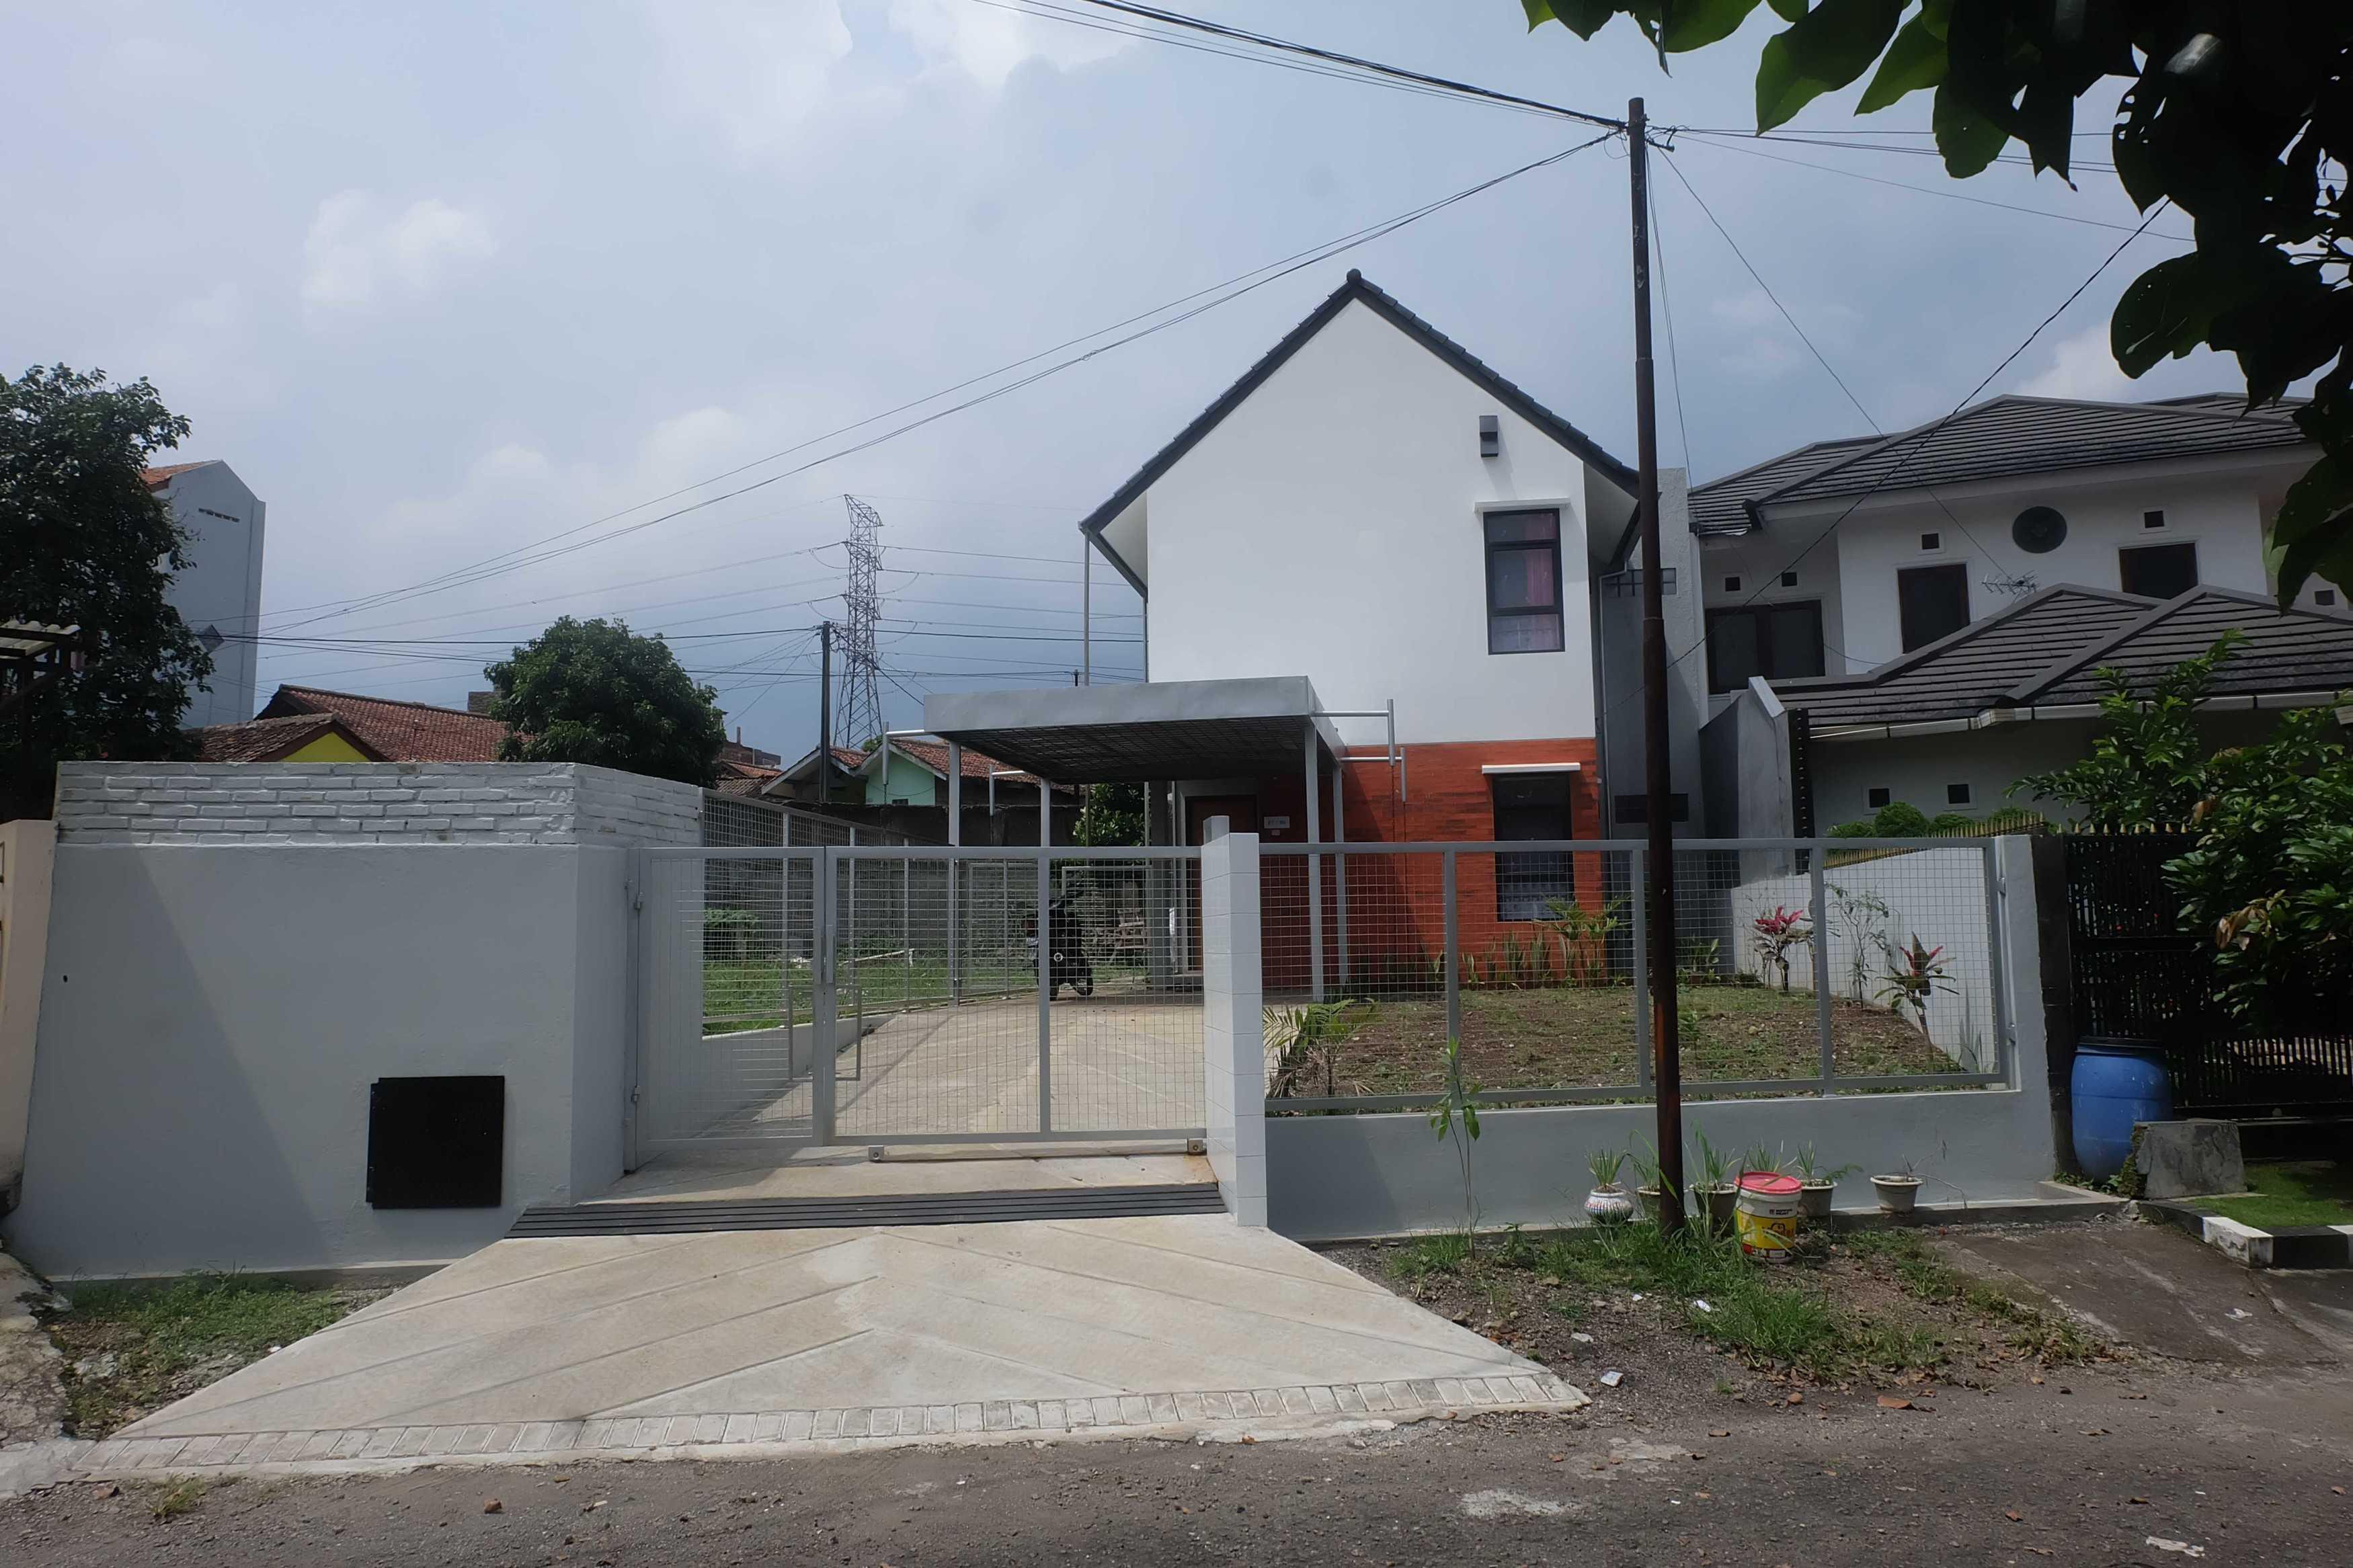 Aaksen Responsible Aarchitecture Rumah Pulang Cimahi, Jawa Barat Cimahi, Jawa Barat Dscf5837   47683